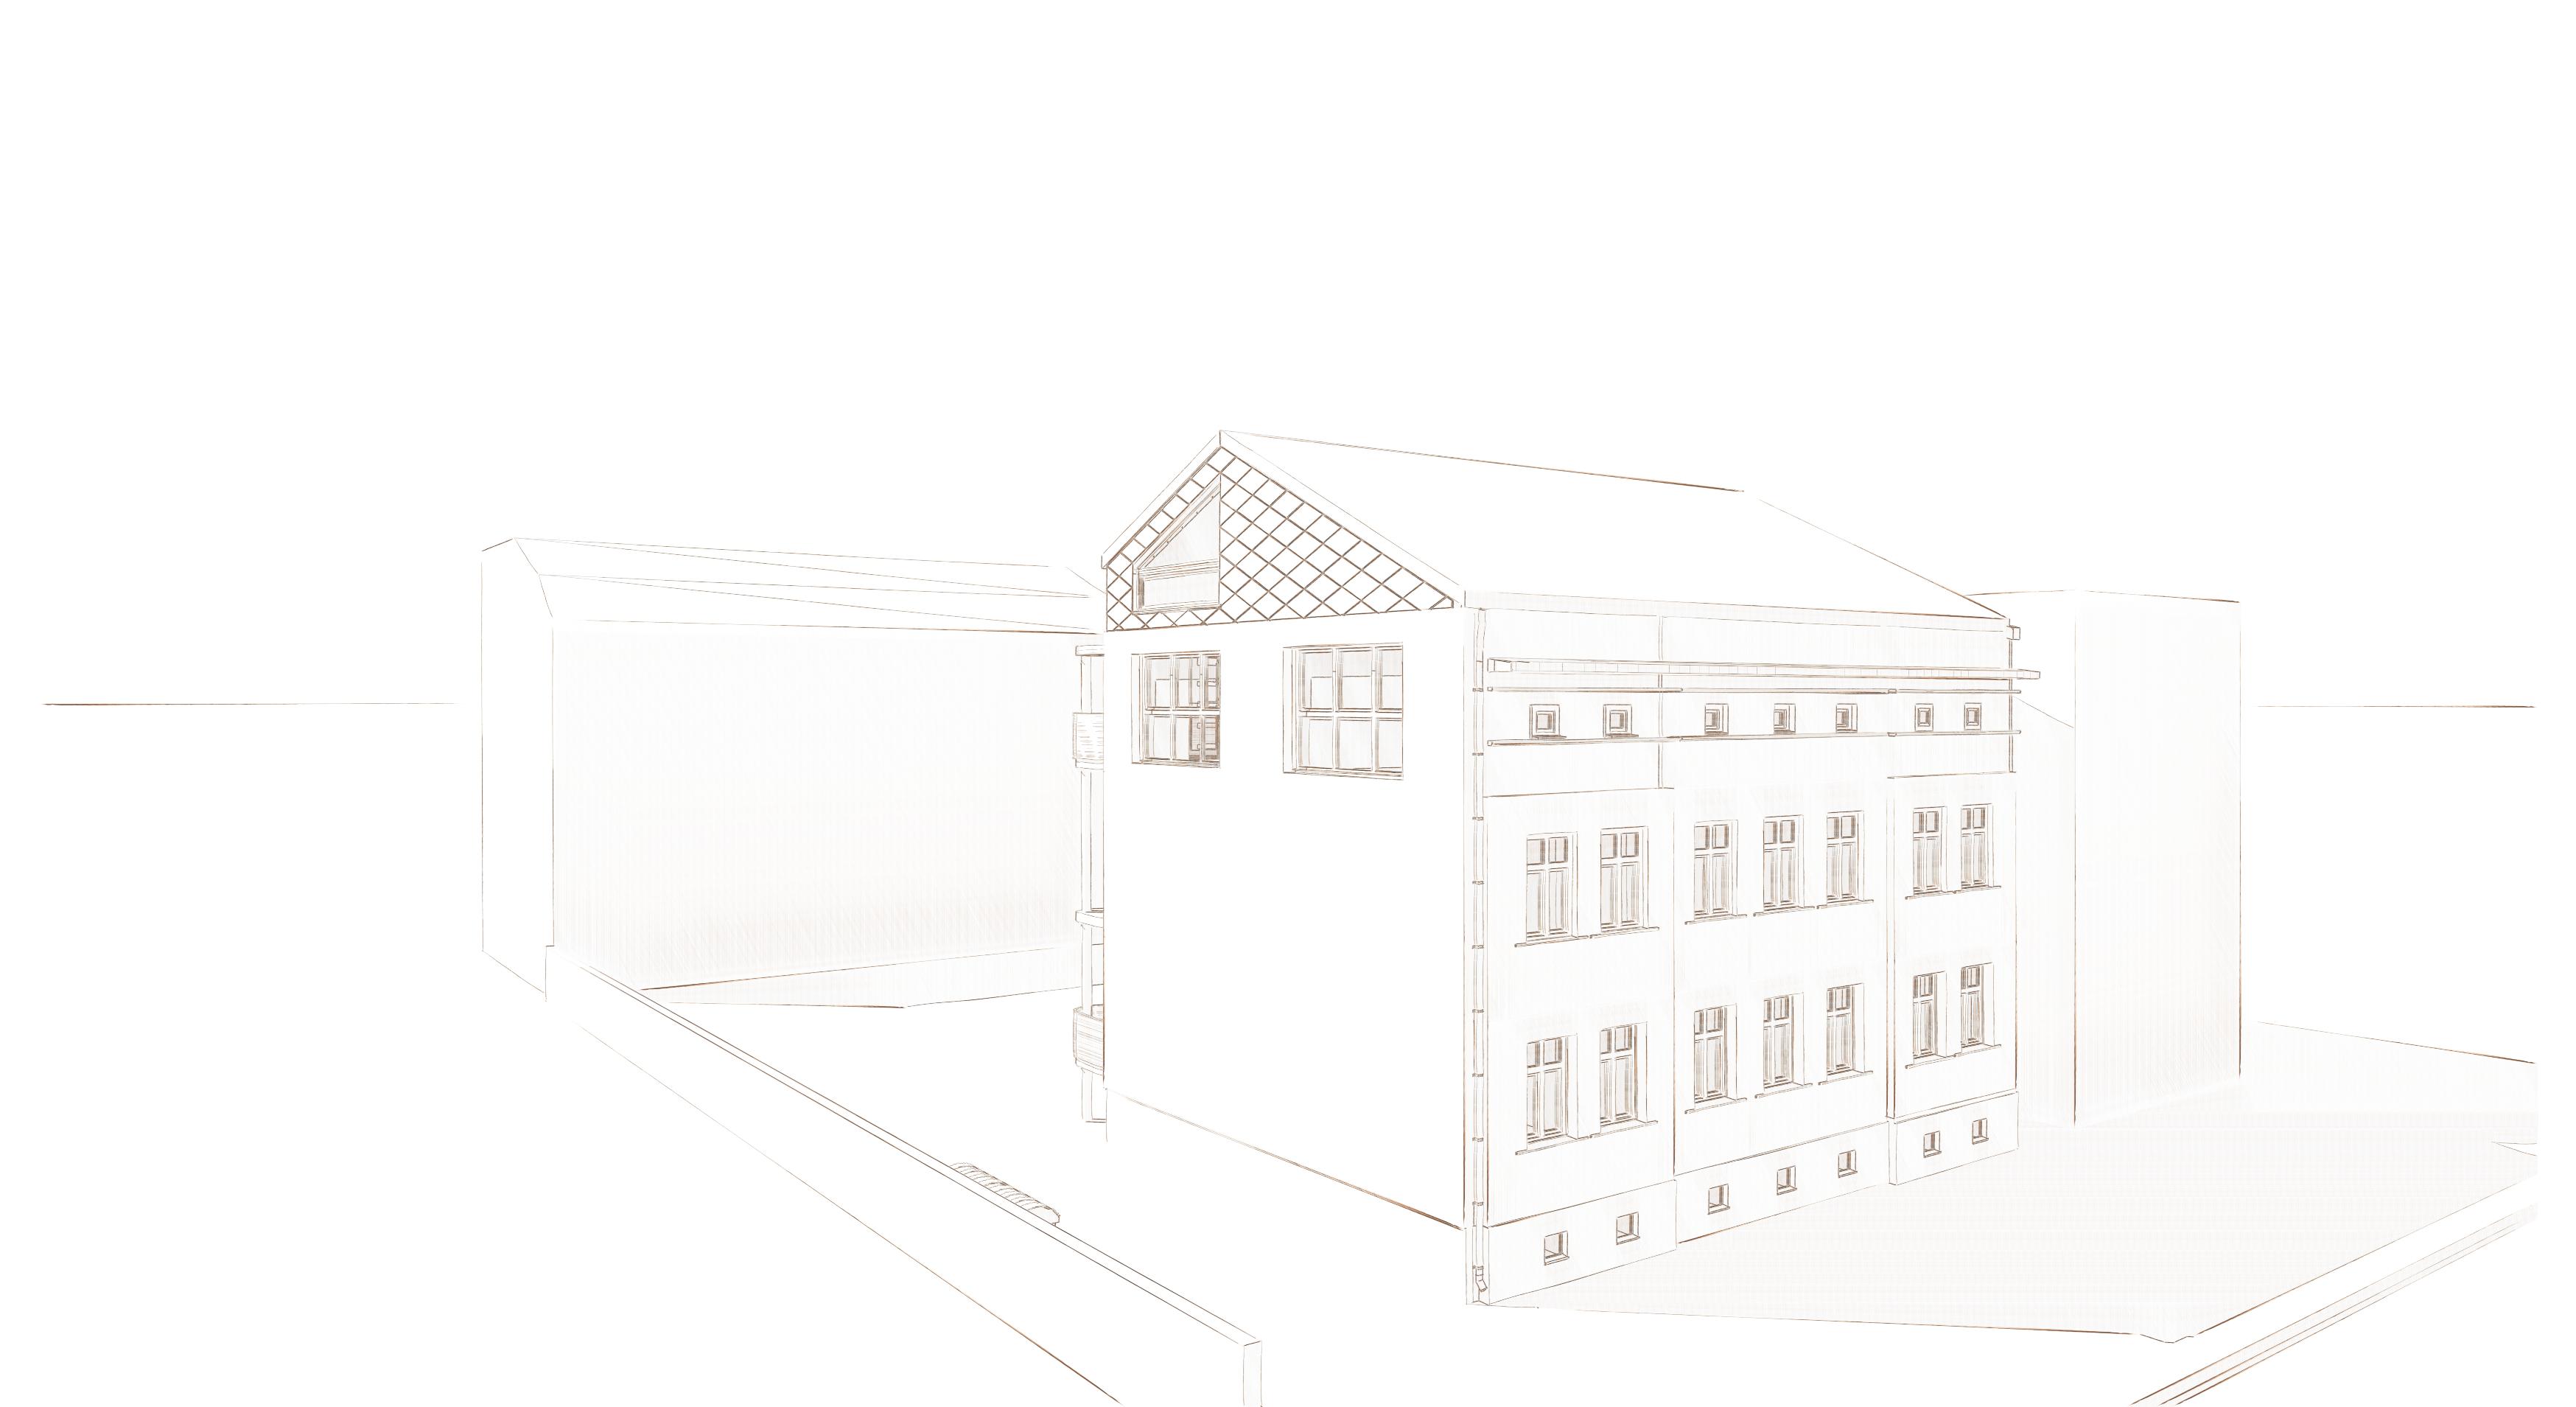 Entwurf Perspektive 1